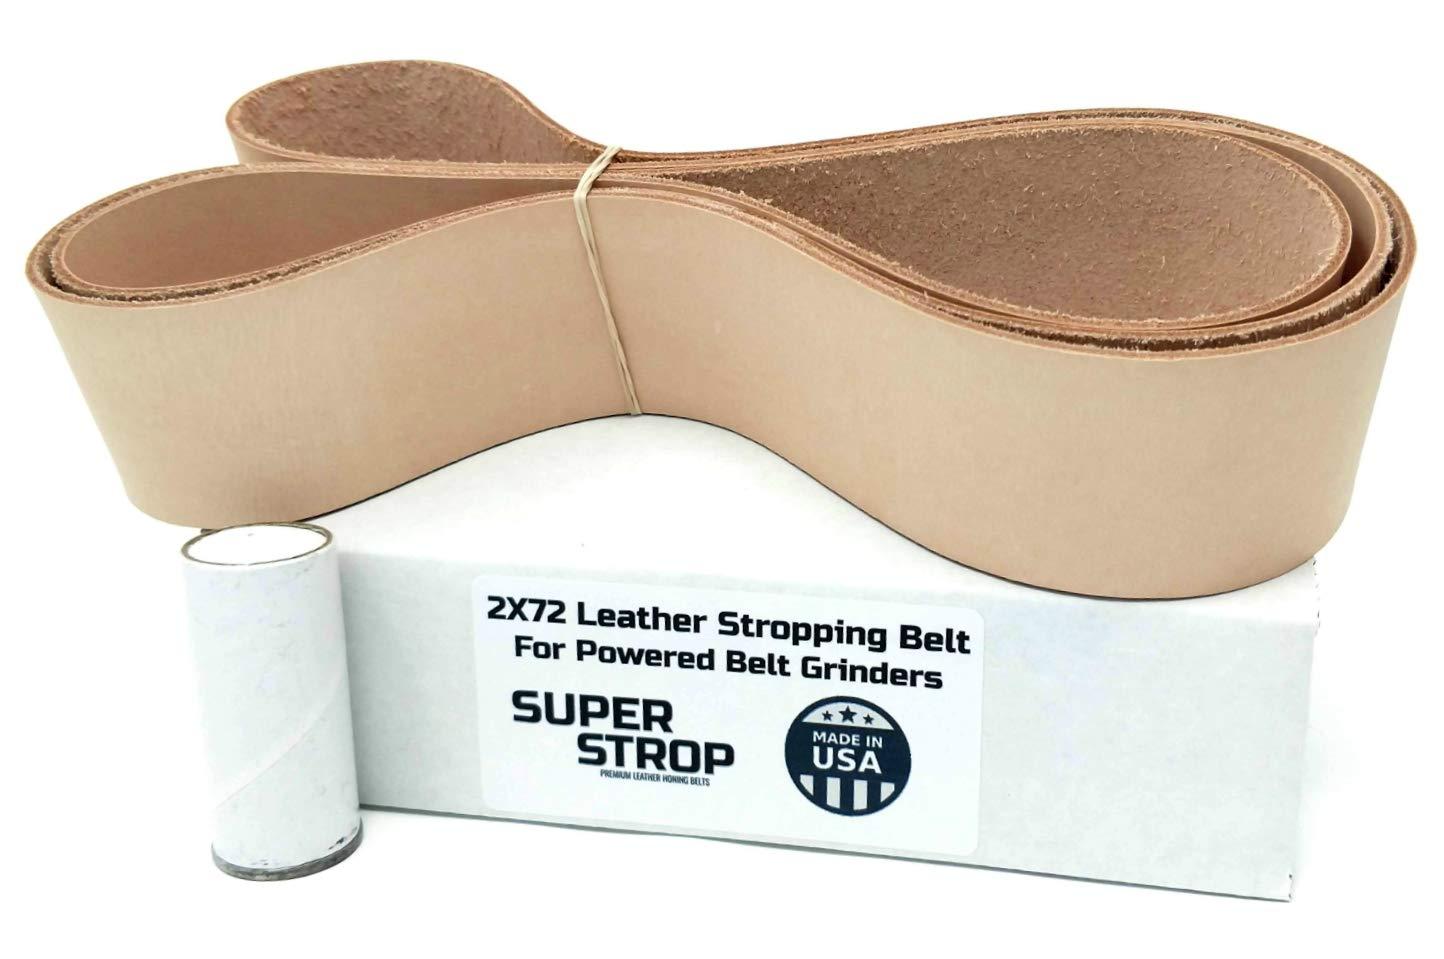 2X72 inch Super Strop Leather Honing Stropping Belt for 2X72 Belt Grinders by Super Strop